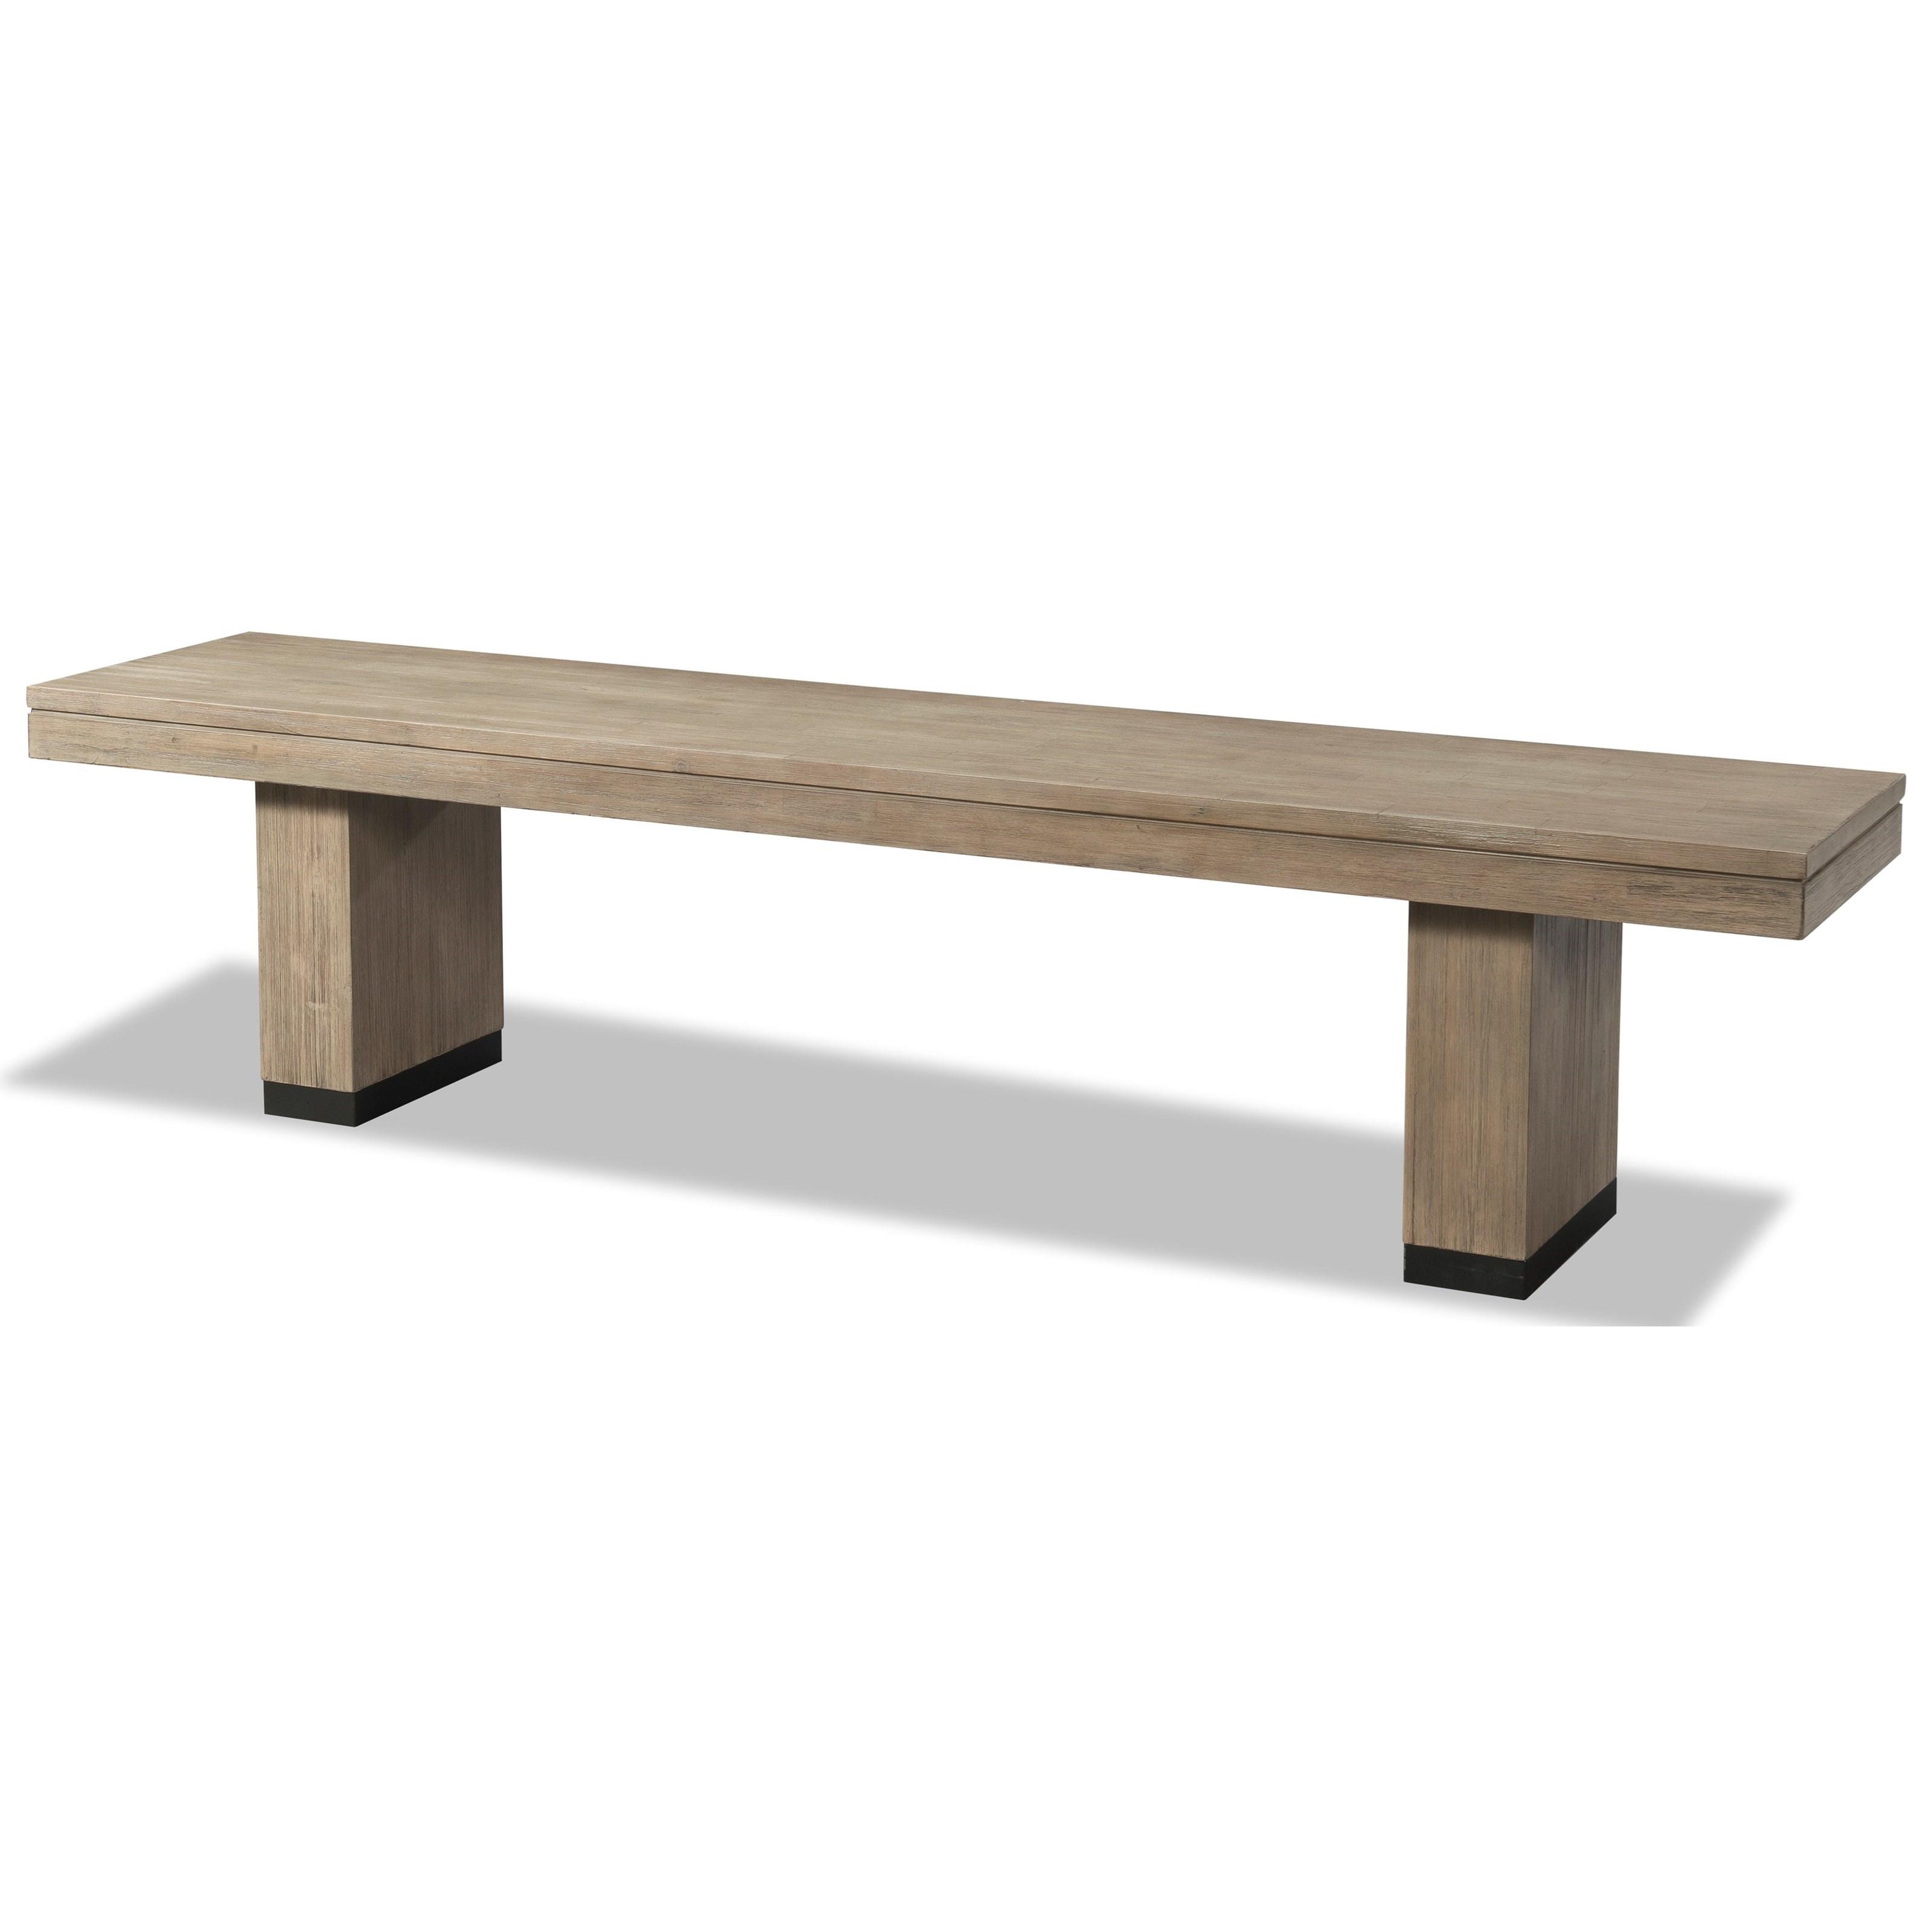 Cresent Fine Furniture Larkspur 6 Piece Trestle Table and  : products2Fcresentfinefurniture2Fcolor2Flarkspur20503503 1502B4x1572B159 b7 from www.belfortfurniture.com size 3200 x 3200 jpeg 418kB